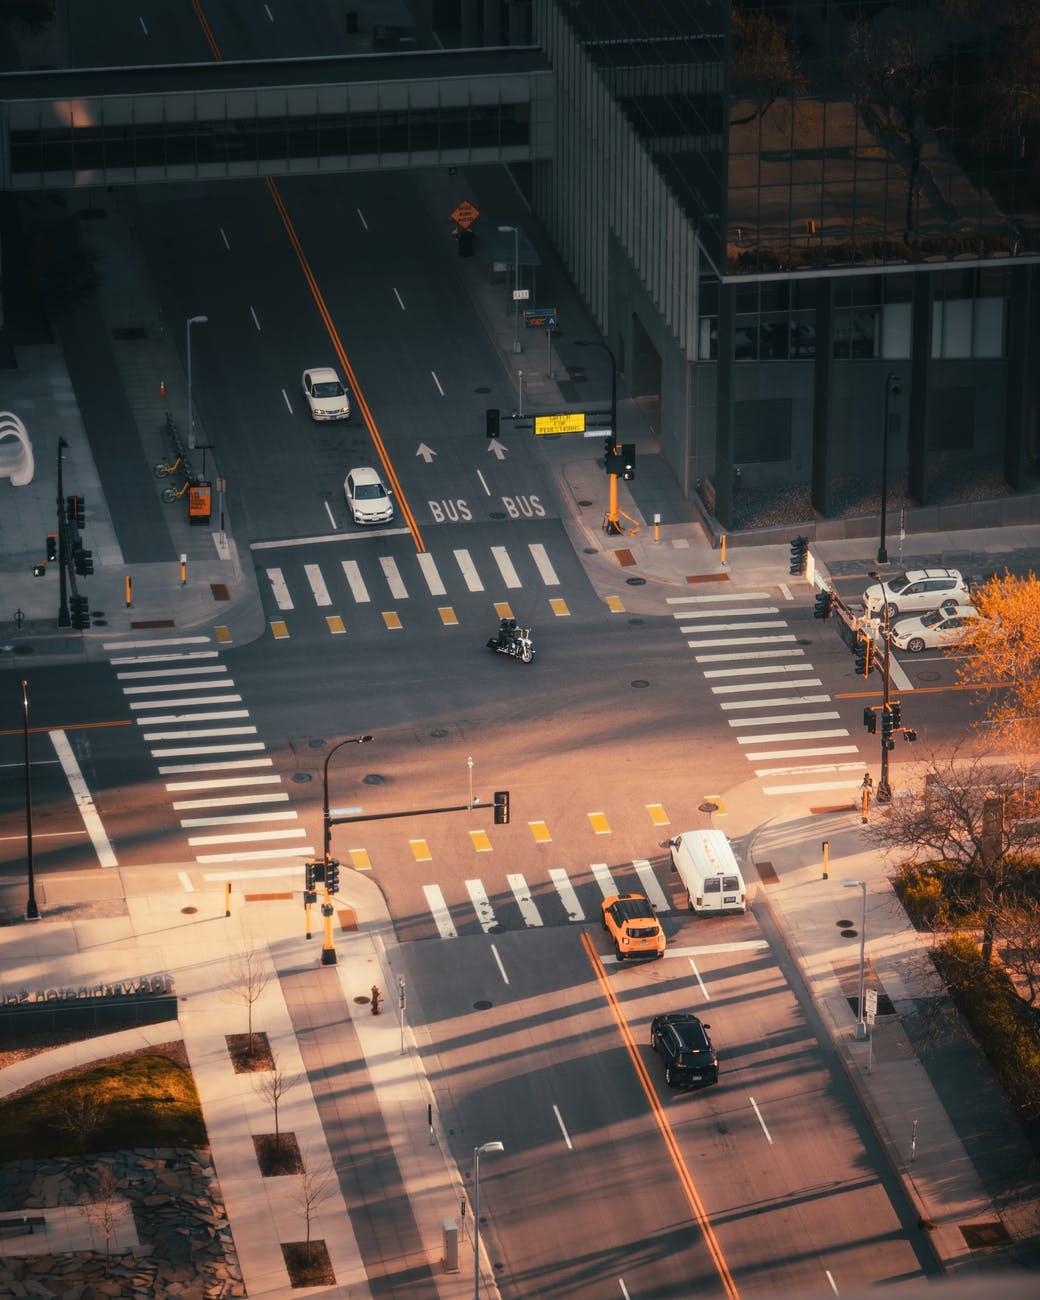 Transit as a mobility integrator